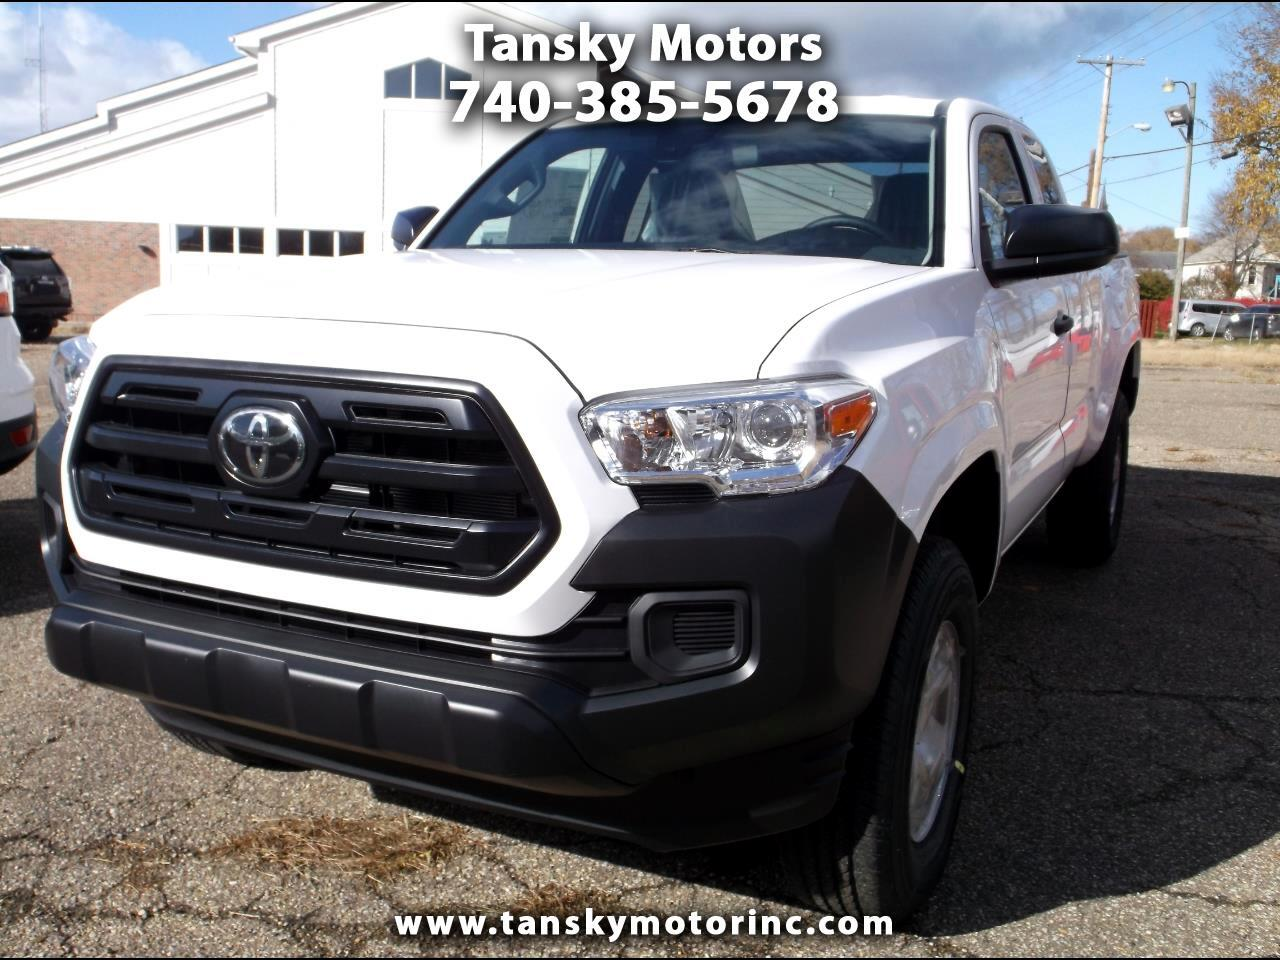 2019 Toyota Tacoma 4WD SR5 Access Cab 6' Bed I4 AT (Natl)